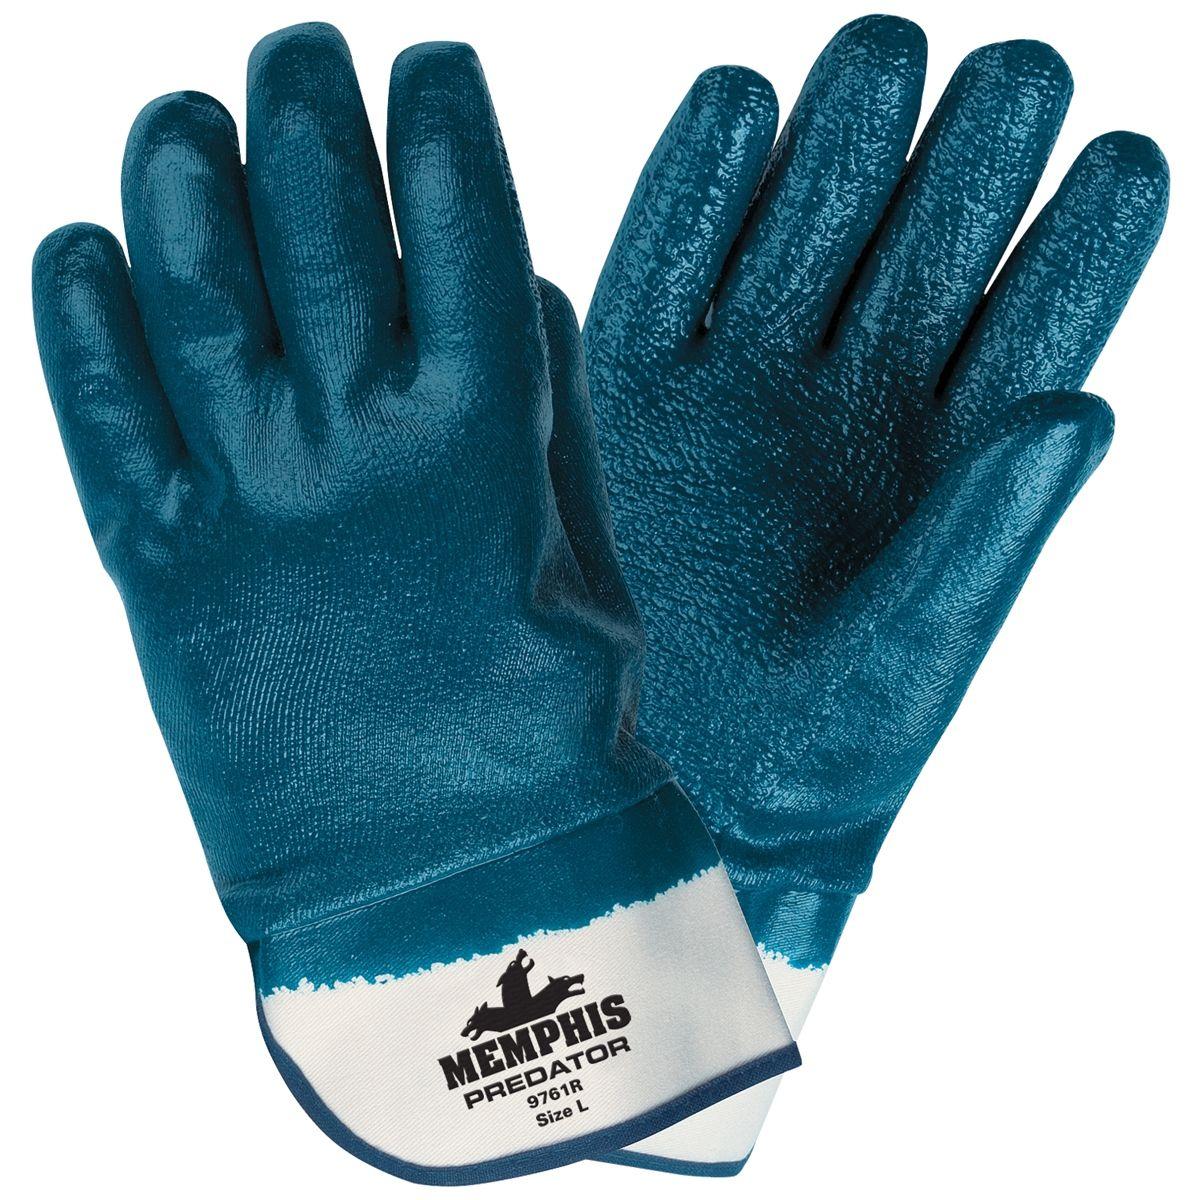 Memphis Predator Gloves Blue Extra Rough Fully Coated